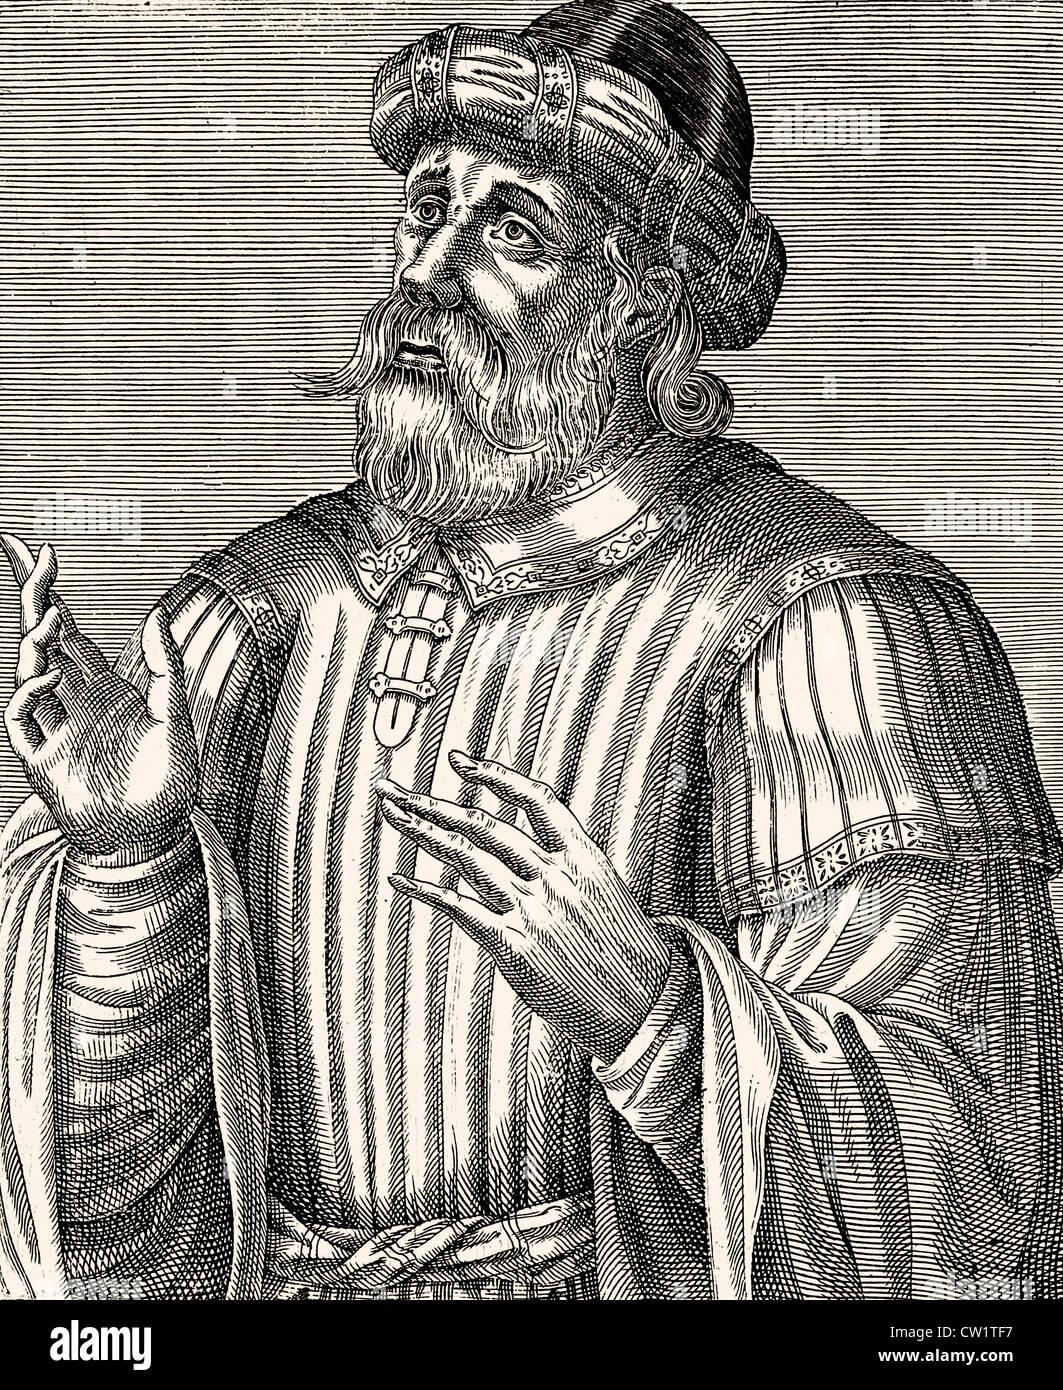 Constantine XI. Palaeologus - Stock Image